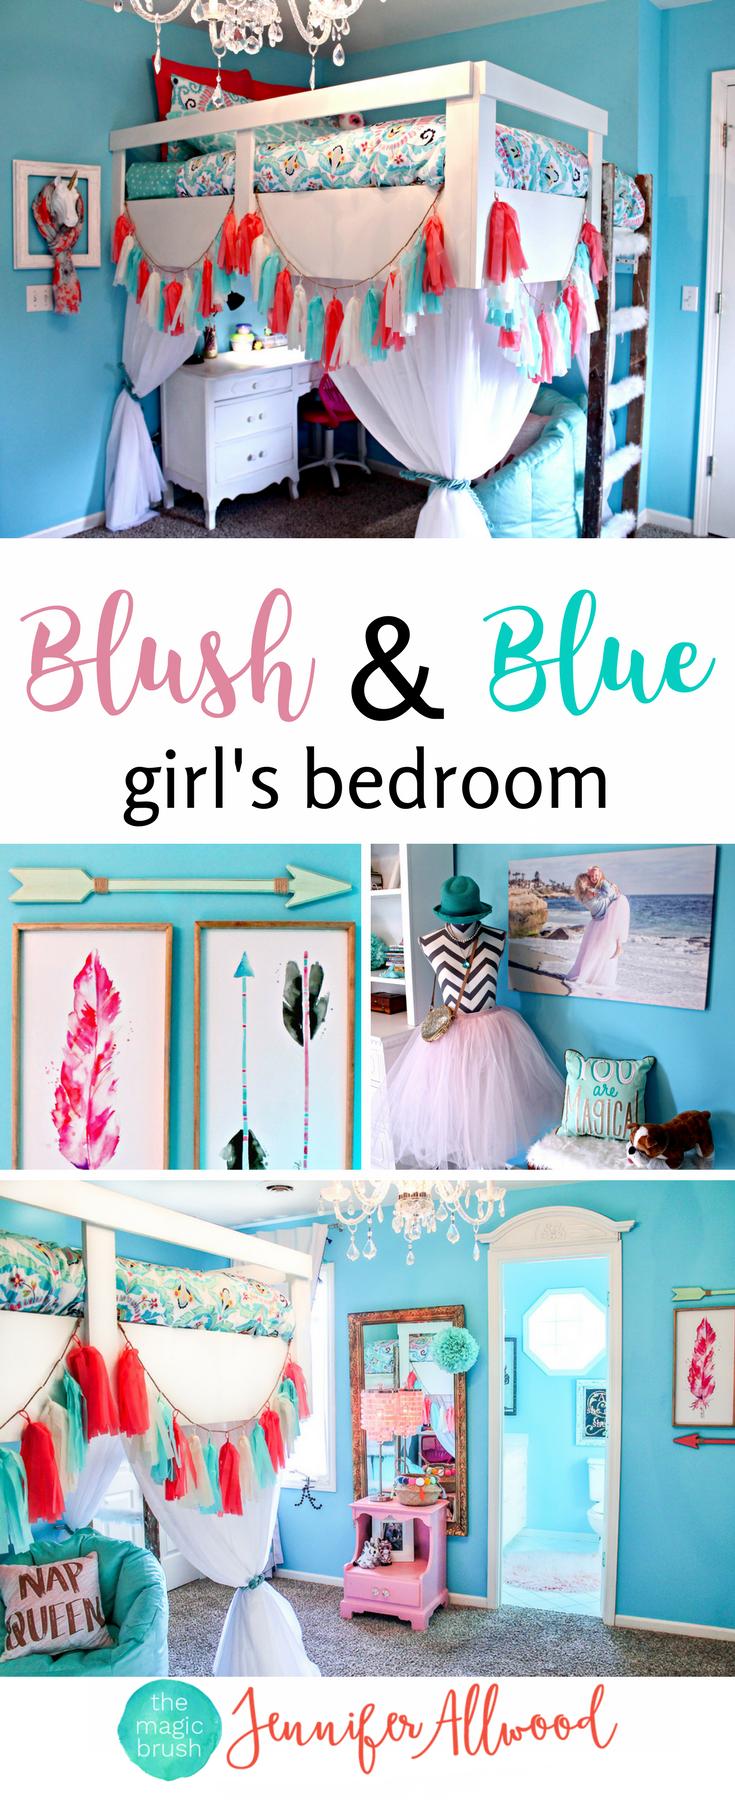 Homemade loft bed ideas  Gorgeous Blush u Blue Girls Bedroom by Jennifer Allwood  Girls